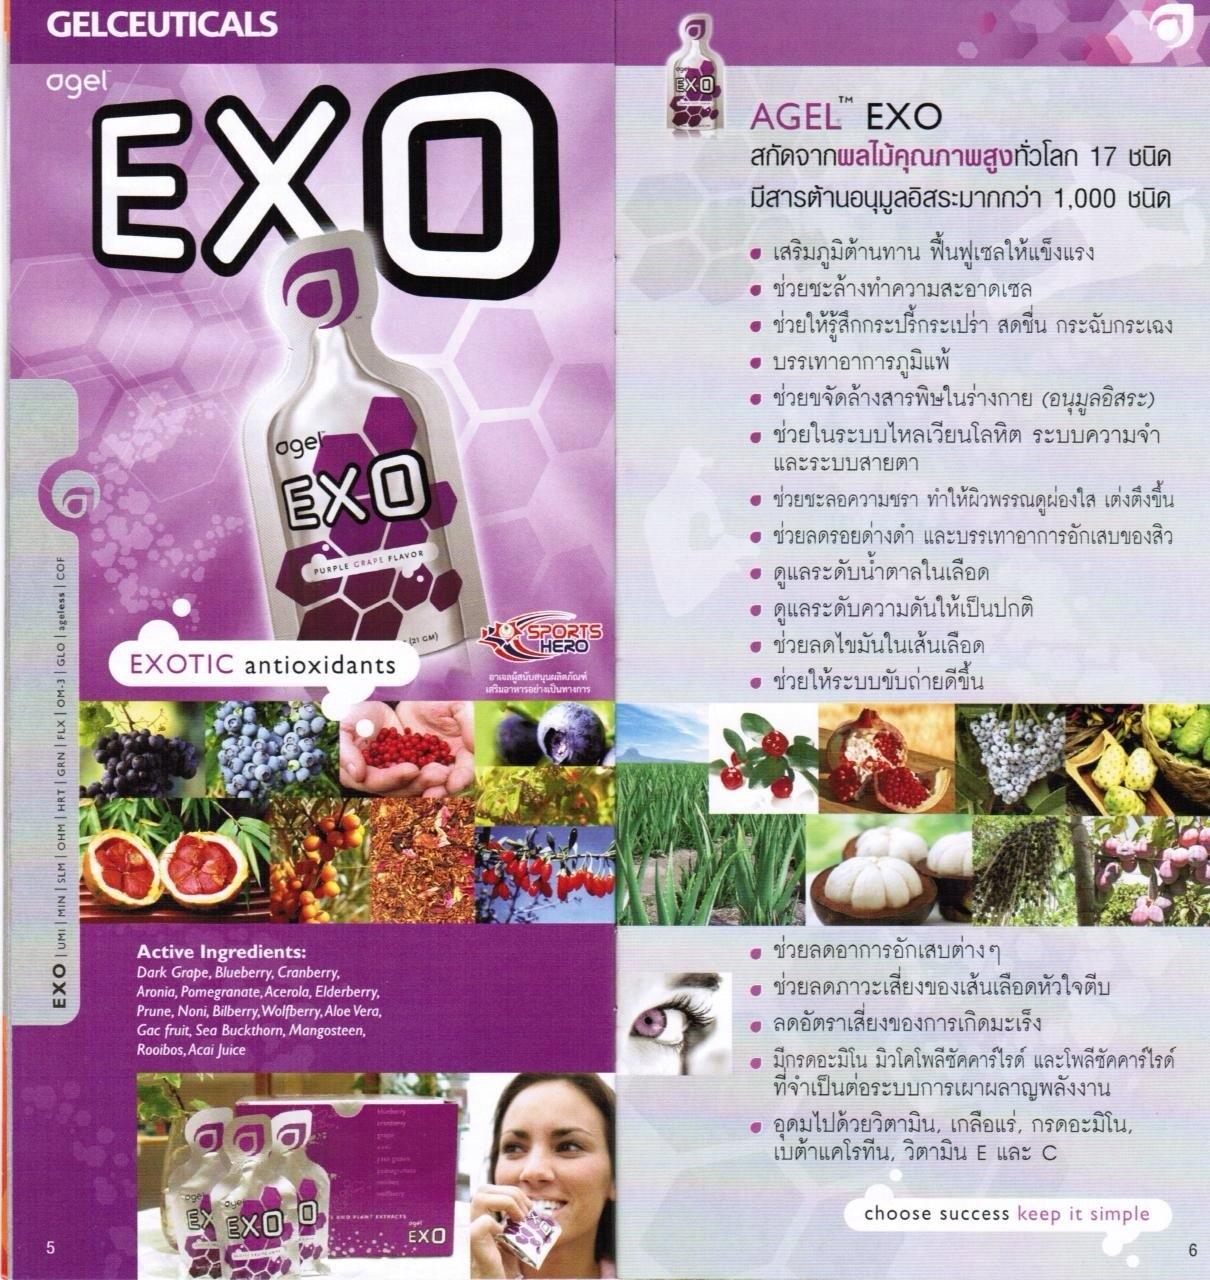 agel-exo-ปวดประจำเดือน-มะเร็งมดลูก-ผิวใส-เอ็กโซ-exo-ราคาถูก-ราคาสมาชิก-สมัครทำธุรกิจ